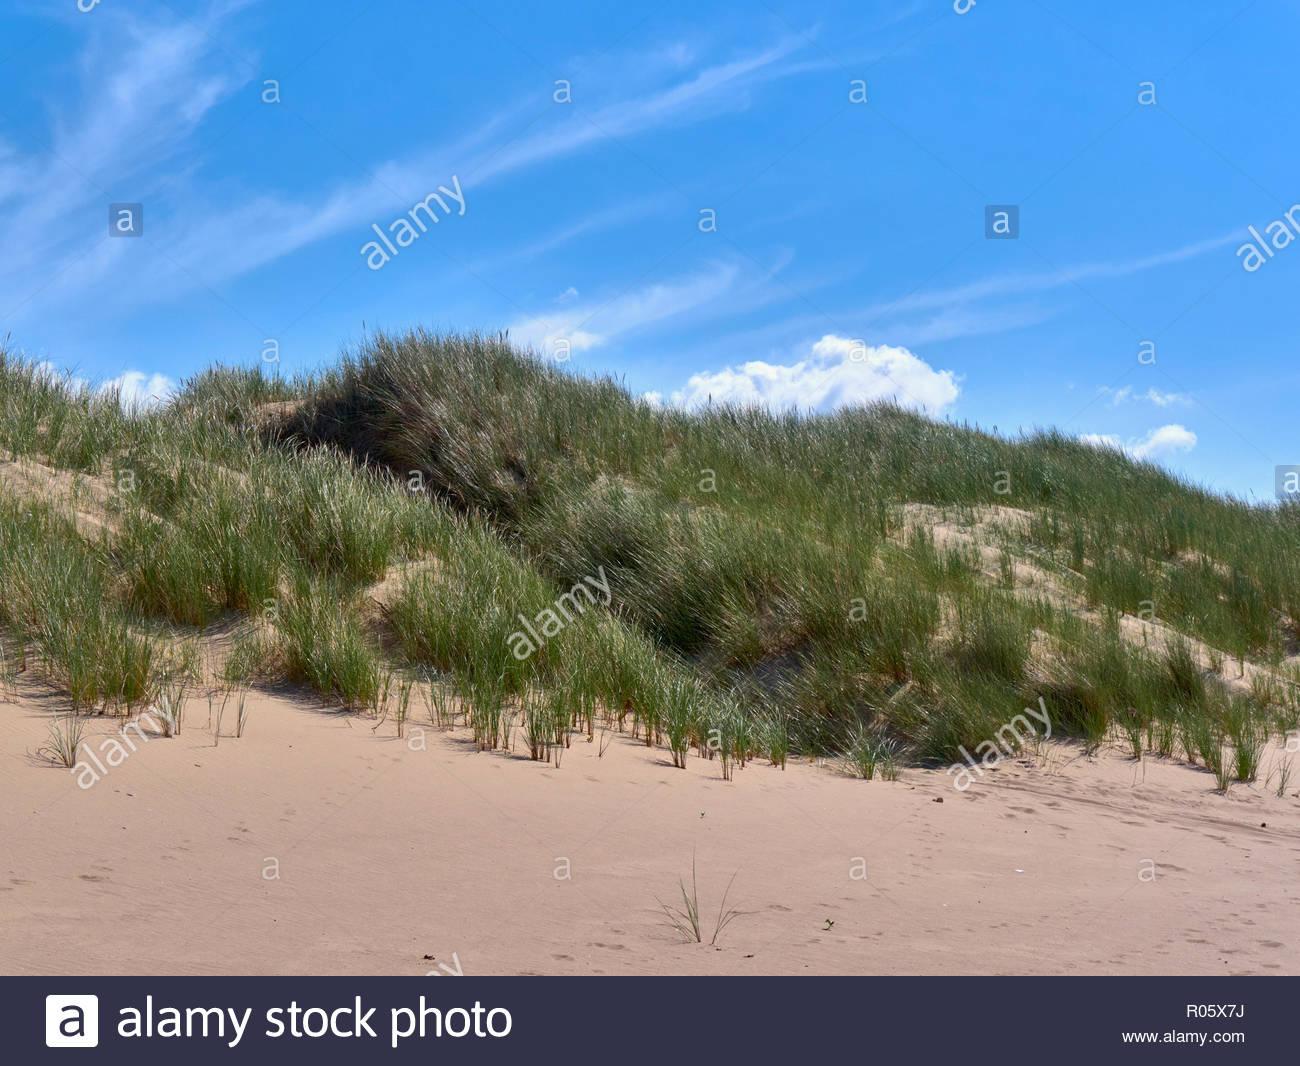 Marram grases Ammophila arenaria on sand dunes in aberavon beach near port talbot south wales uk - Stock Image